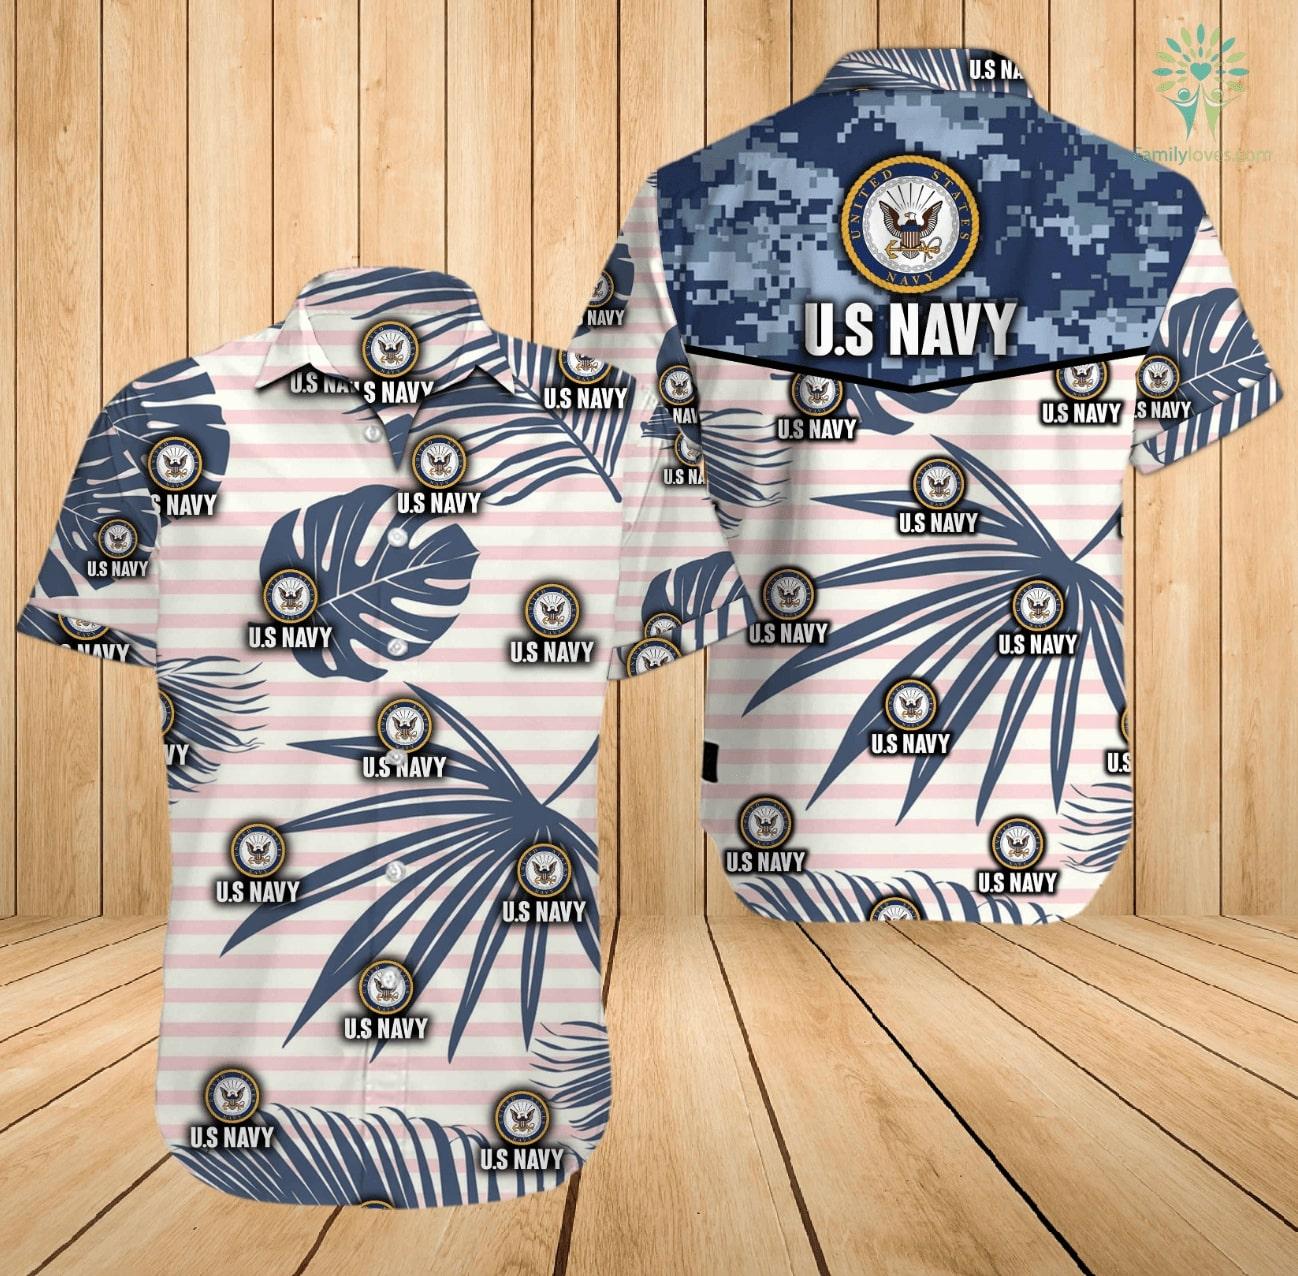 US navy all over printed hawaiian shirt 2